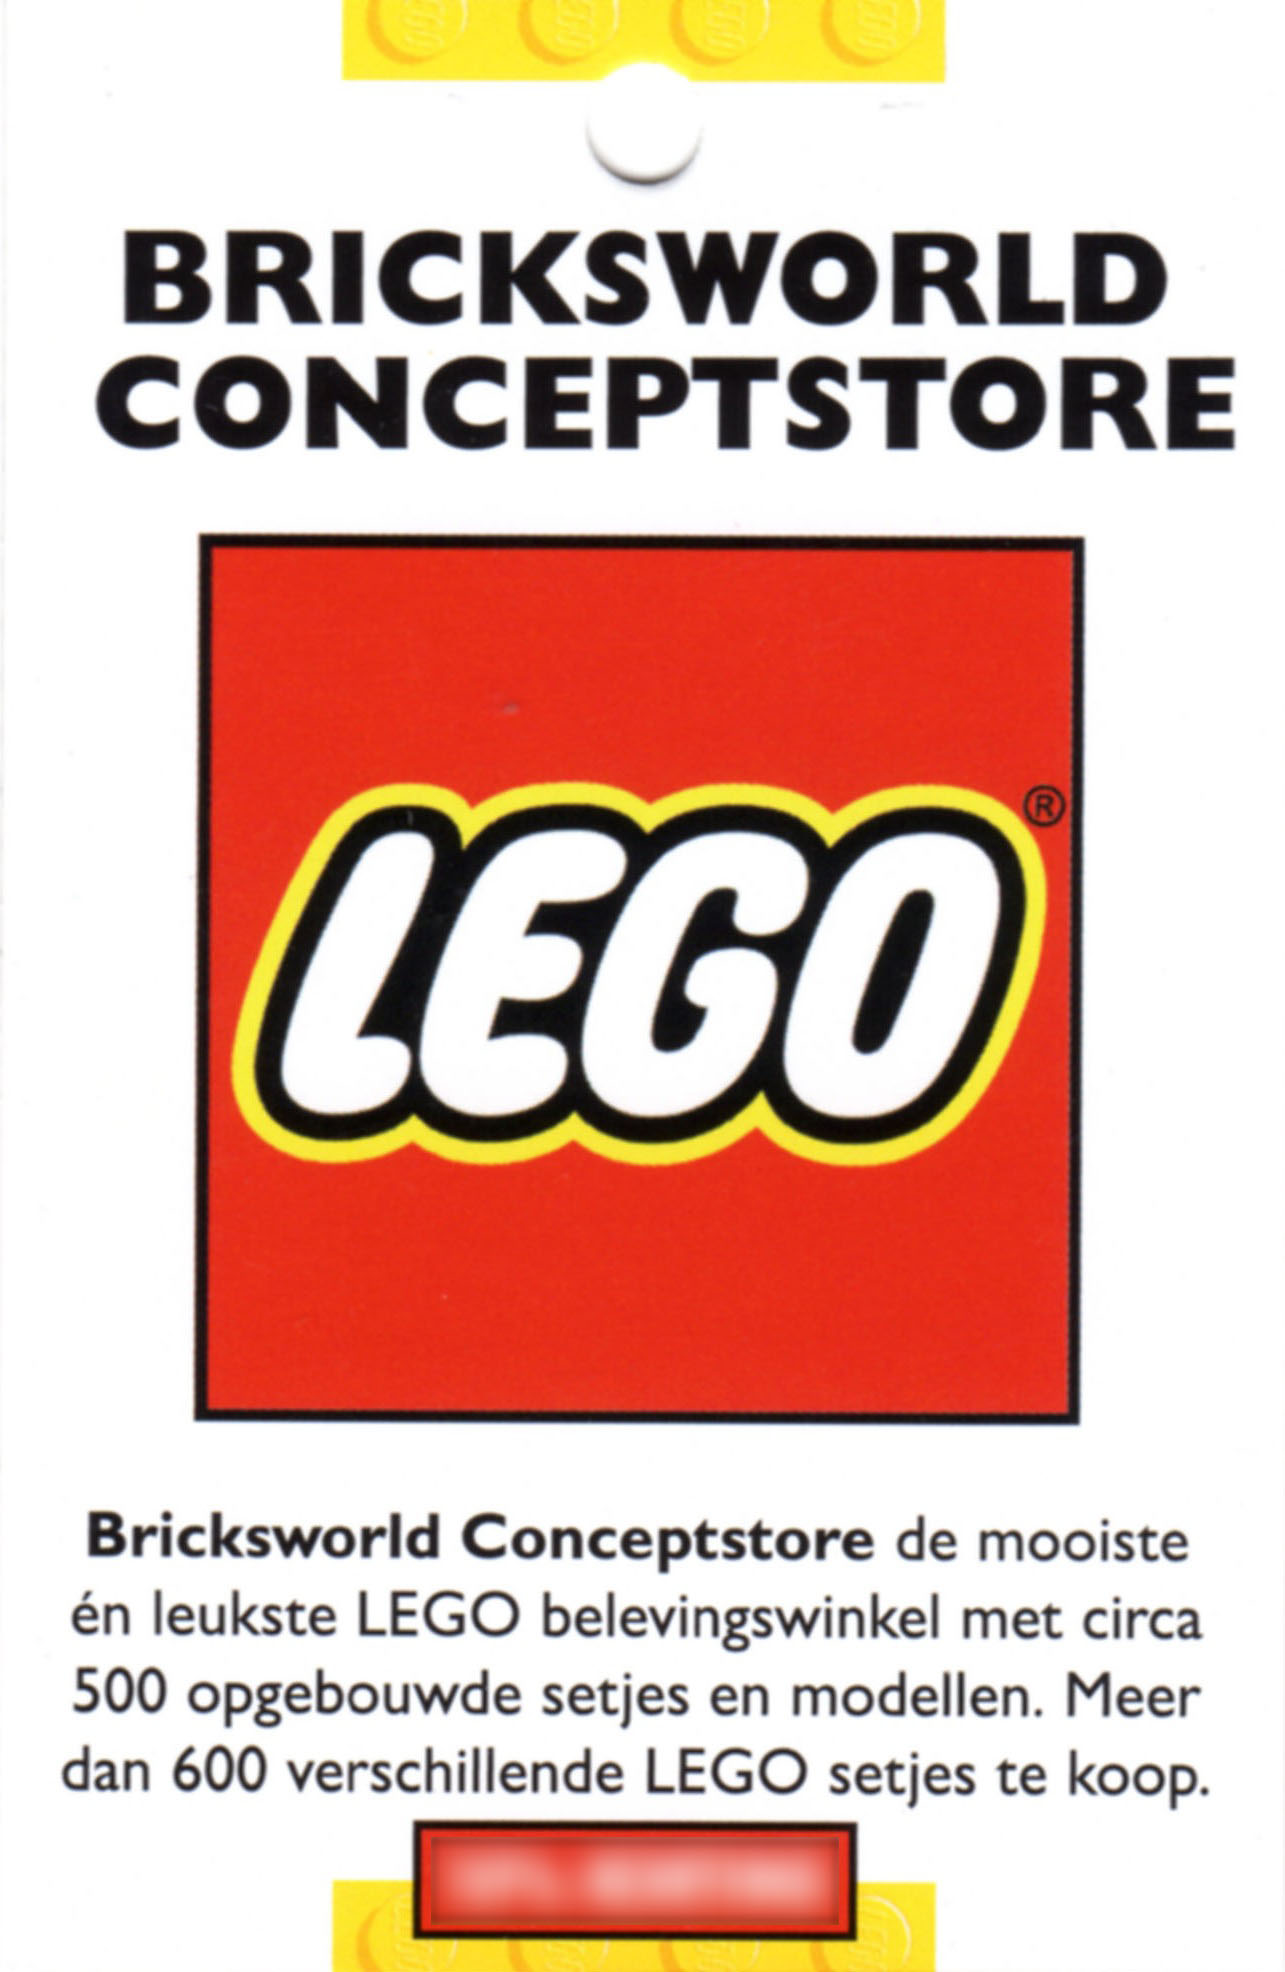 Bricksworld conceptstore